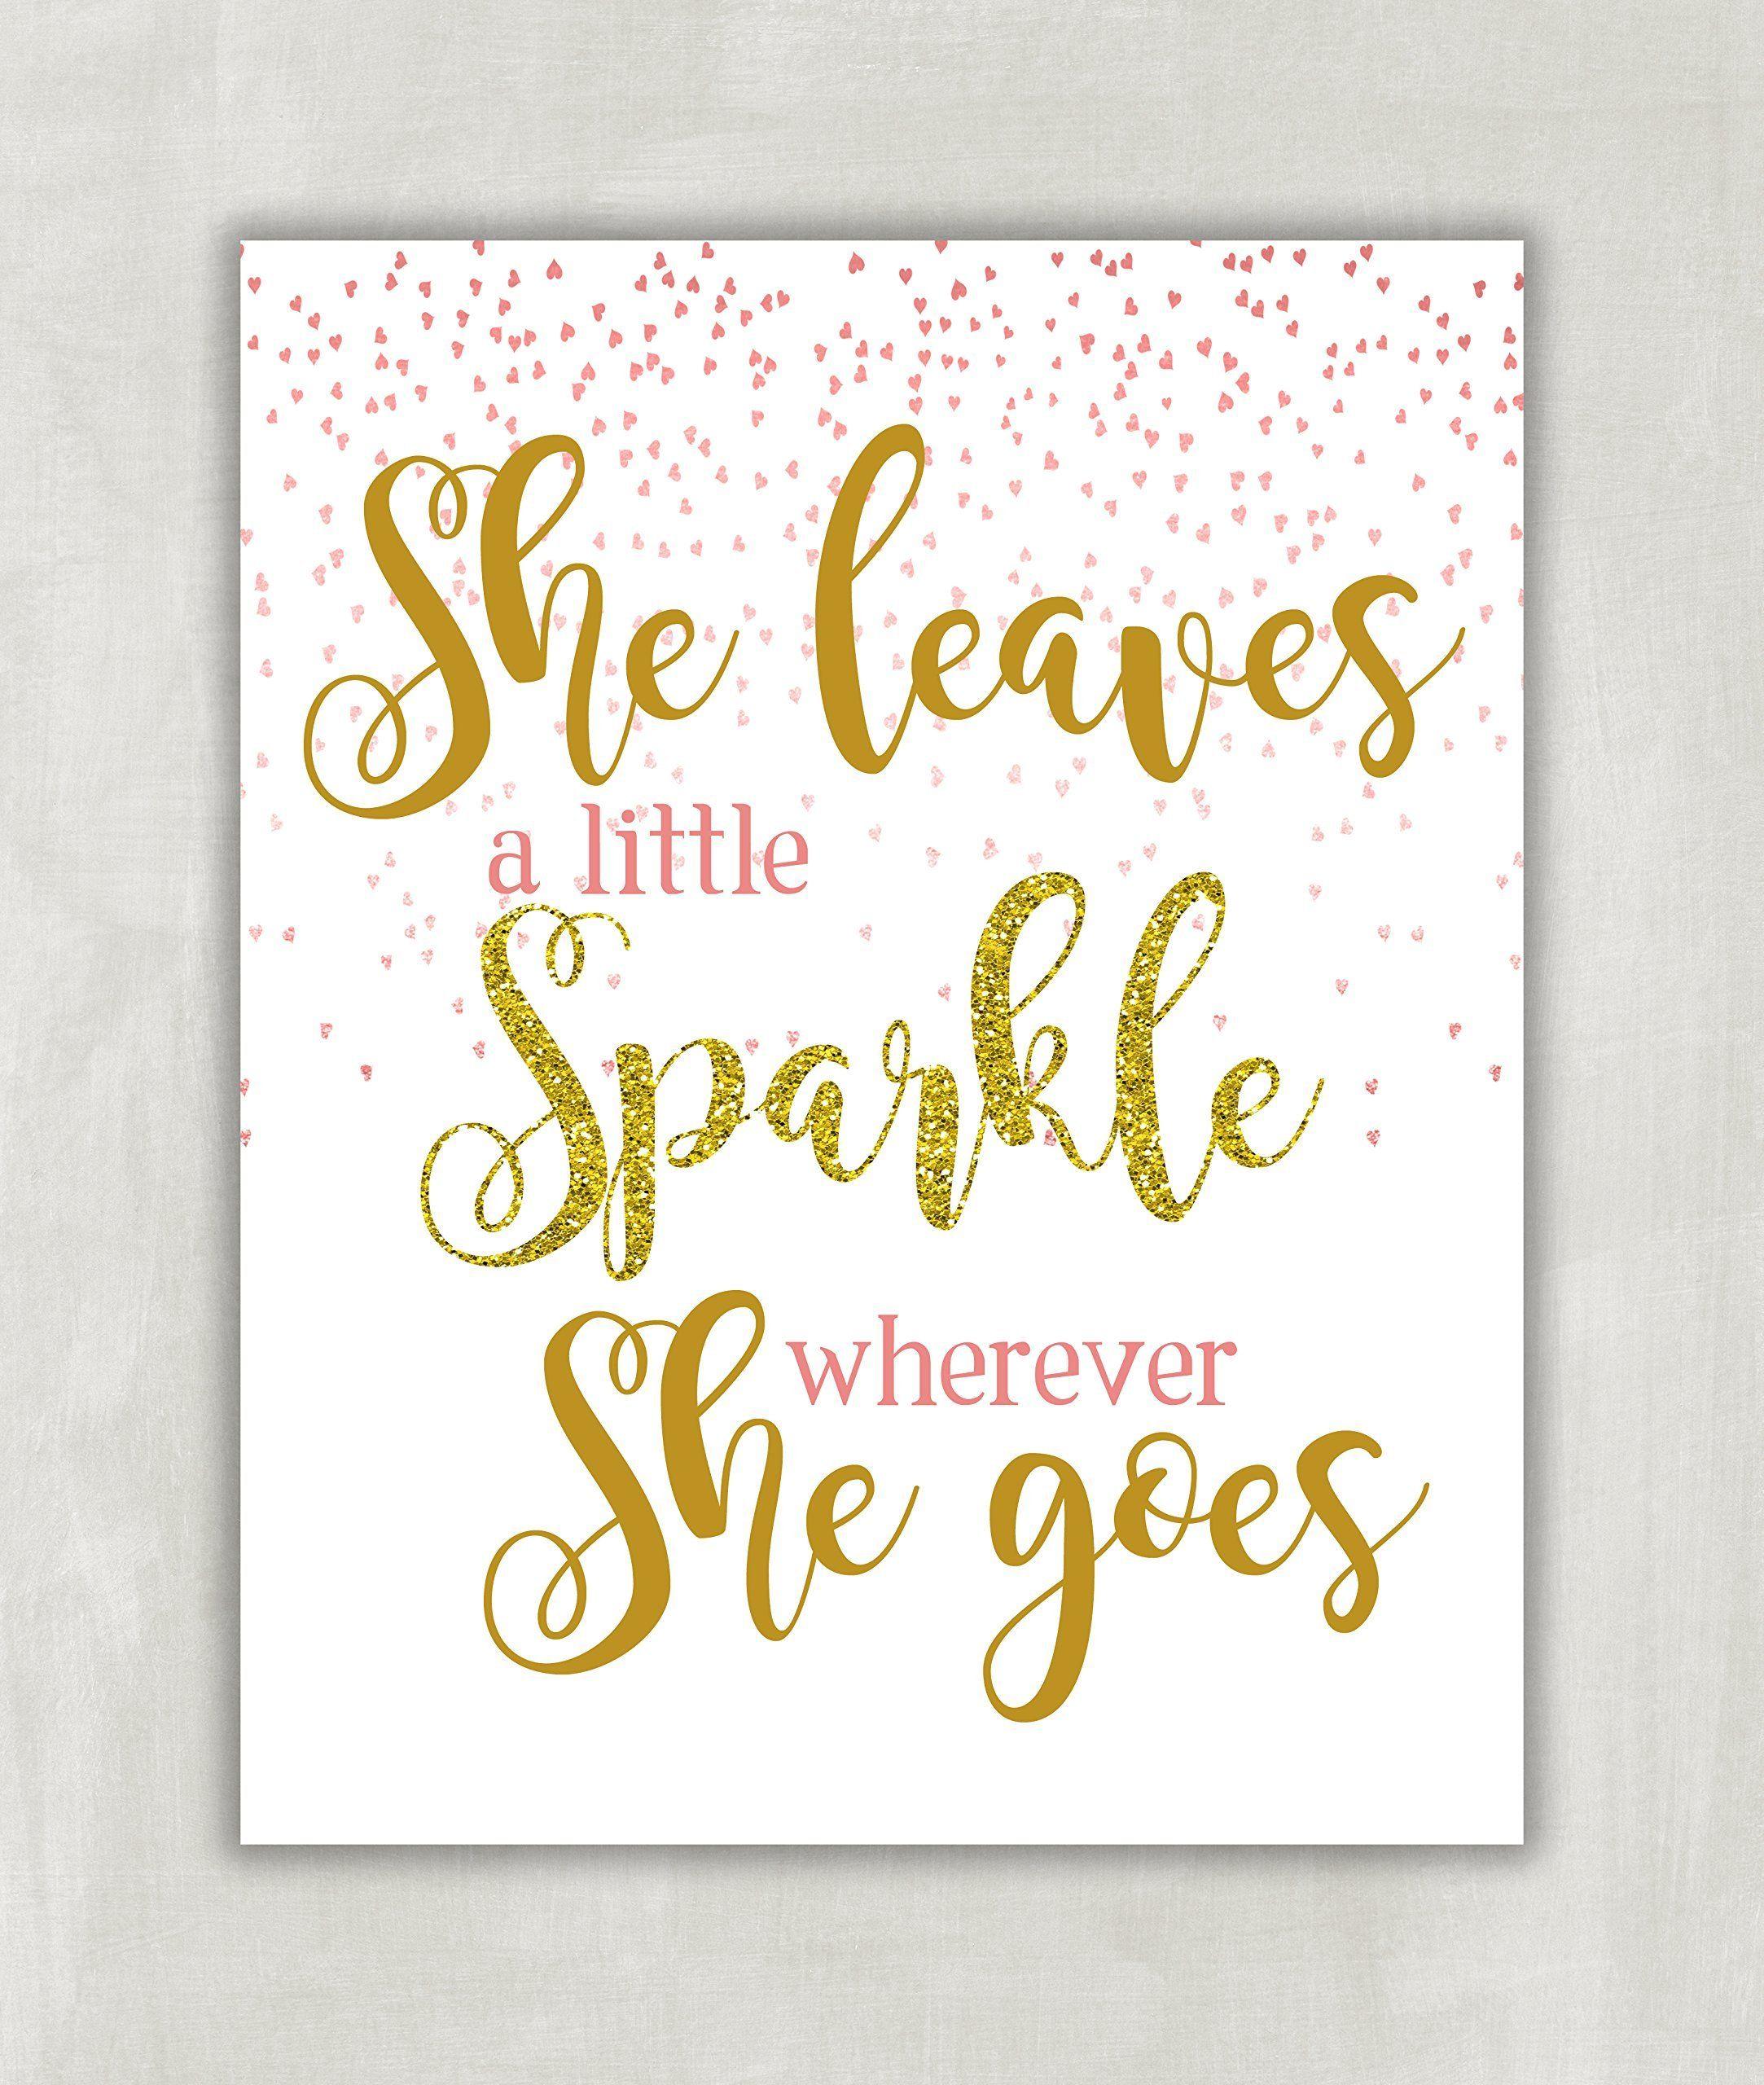 She Leaves A Little Sparkle Wherever She Goes  Childrens